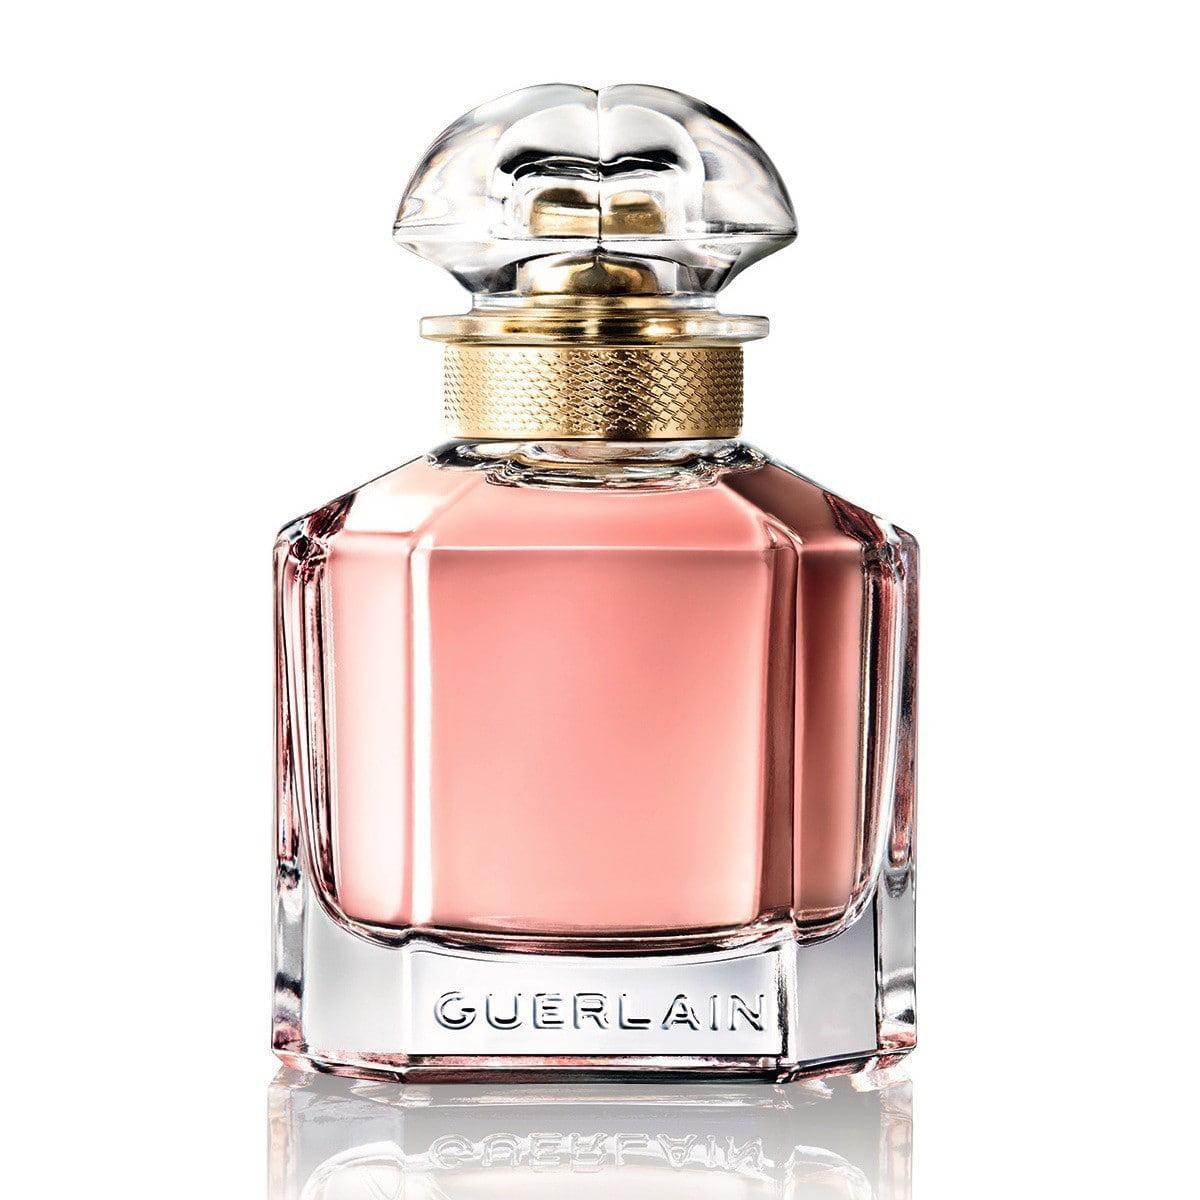 Mon Guerlain Perfume for Women - 1.6 oz - Walmart.com